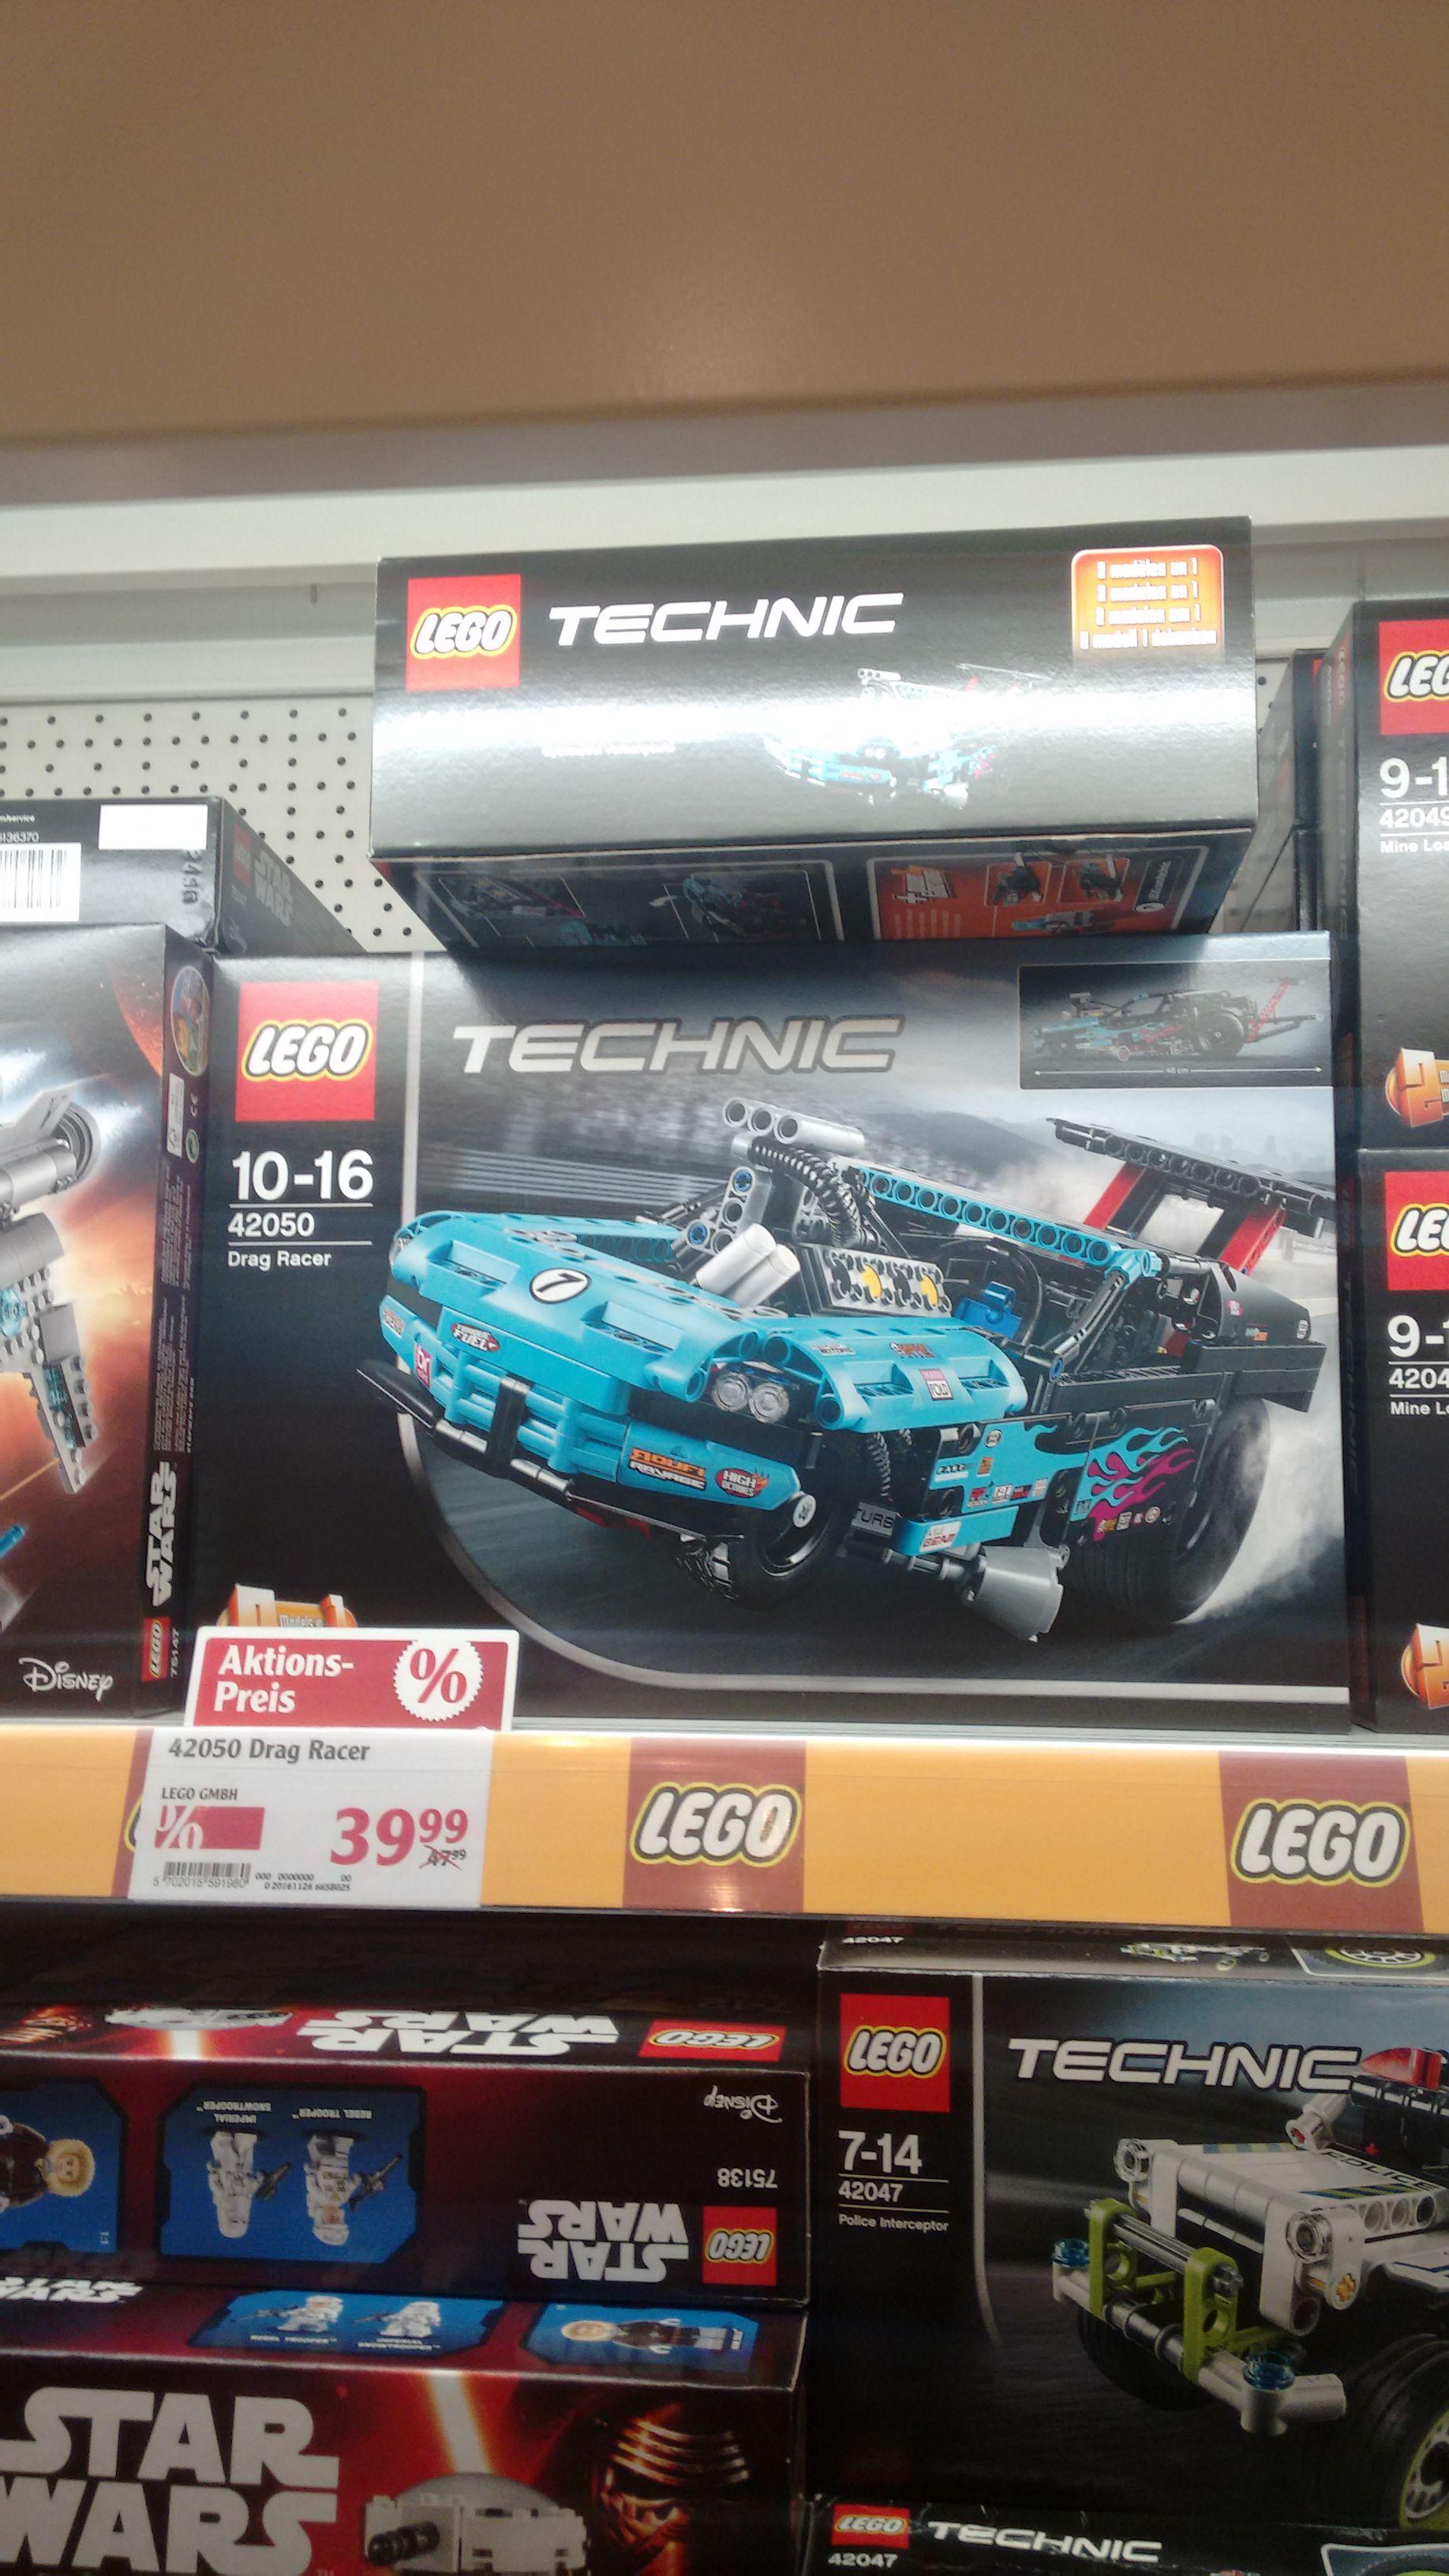 Lokal: Globus Ludwigshafen Oggersheim, Lego Technik Drag Racer 42050